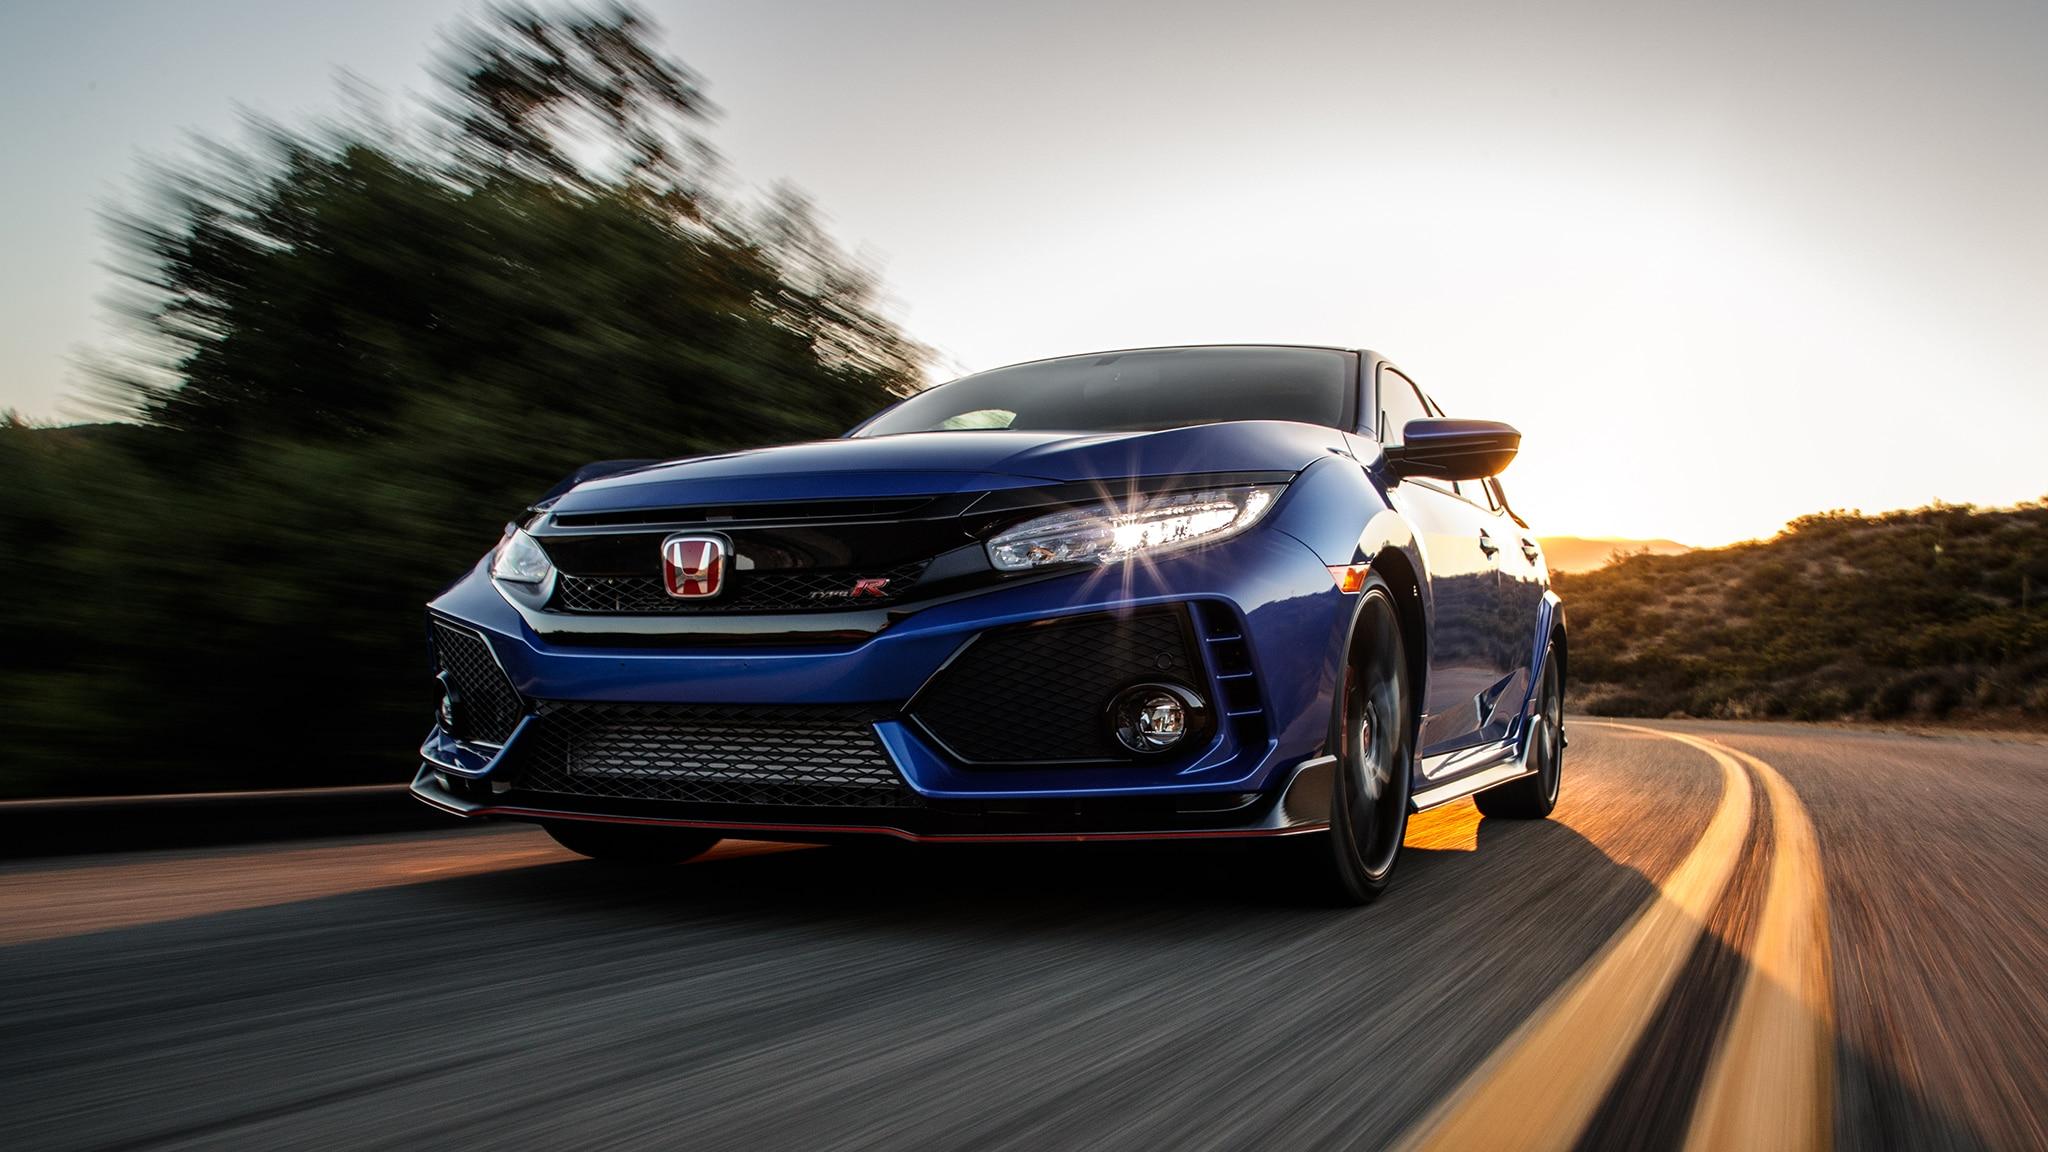 2018 Honda Civic Type R Front Three Quarter In Motion